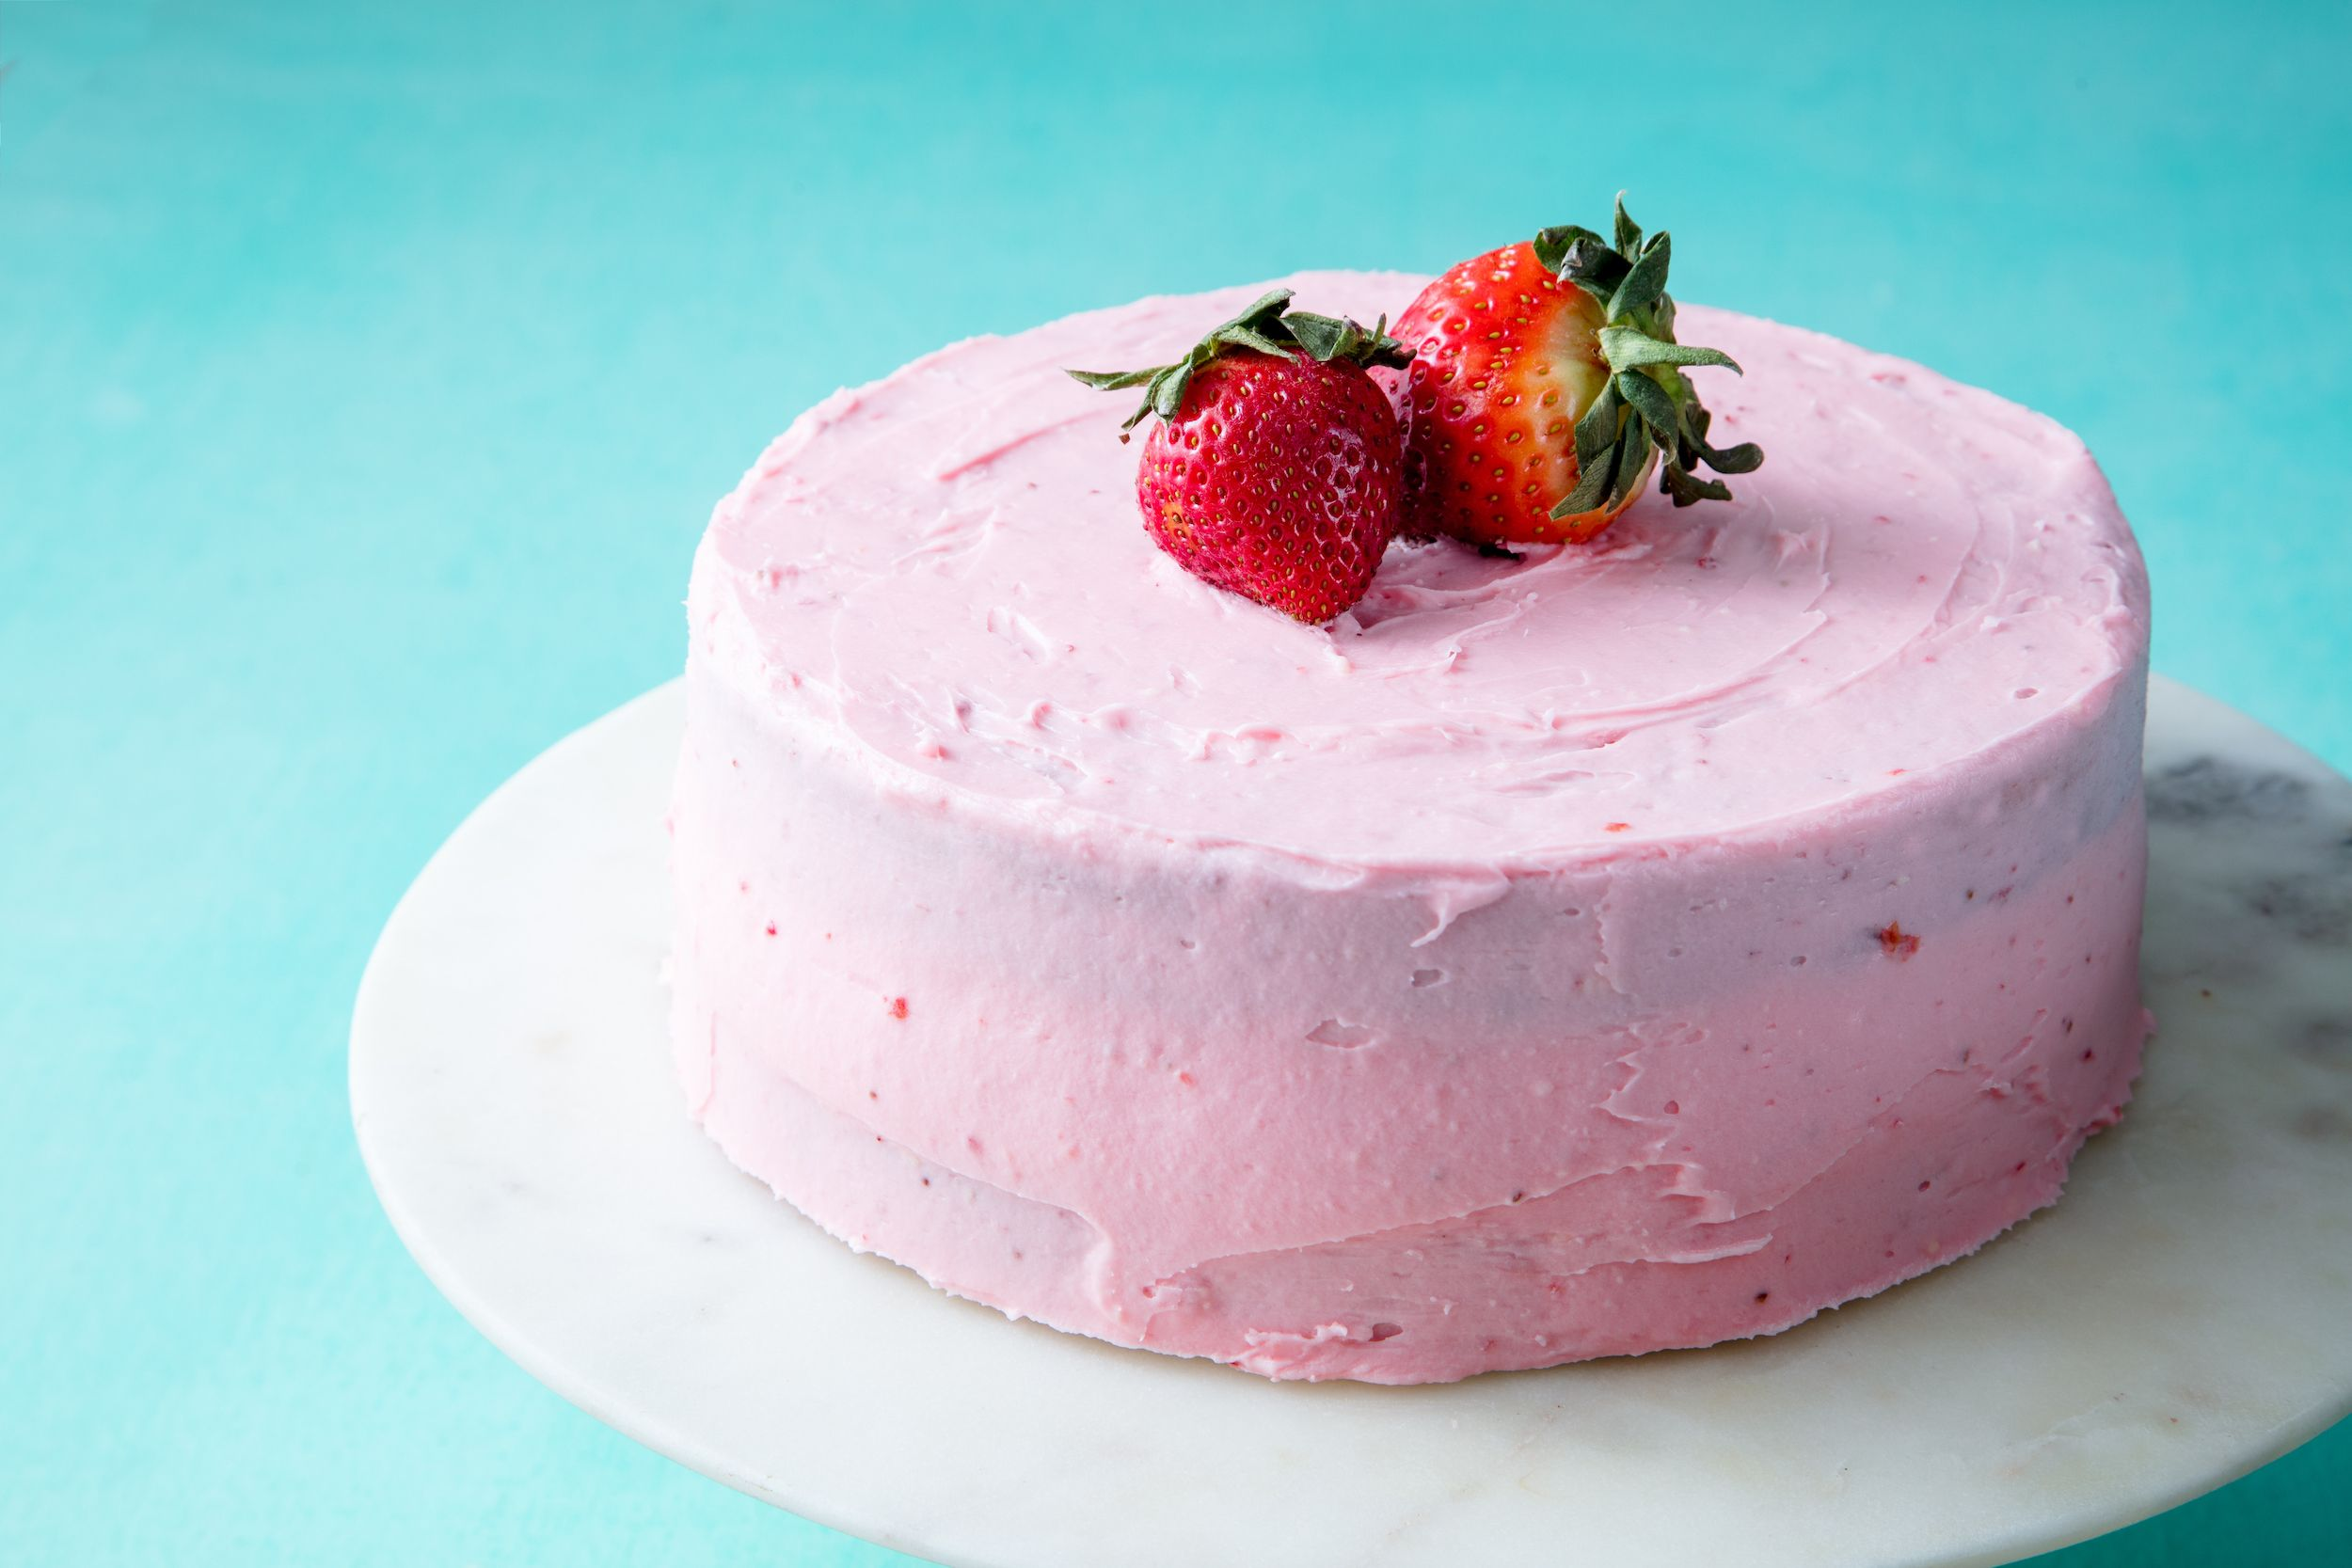 Best Homemade Strawberry Cake Recipe How To Make Homemade